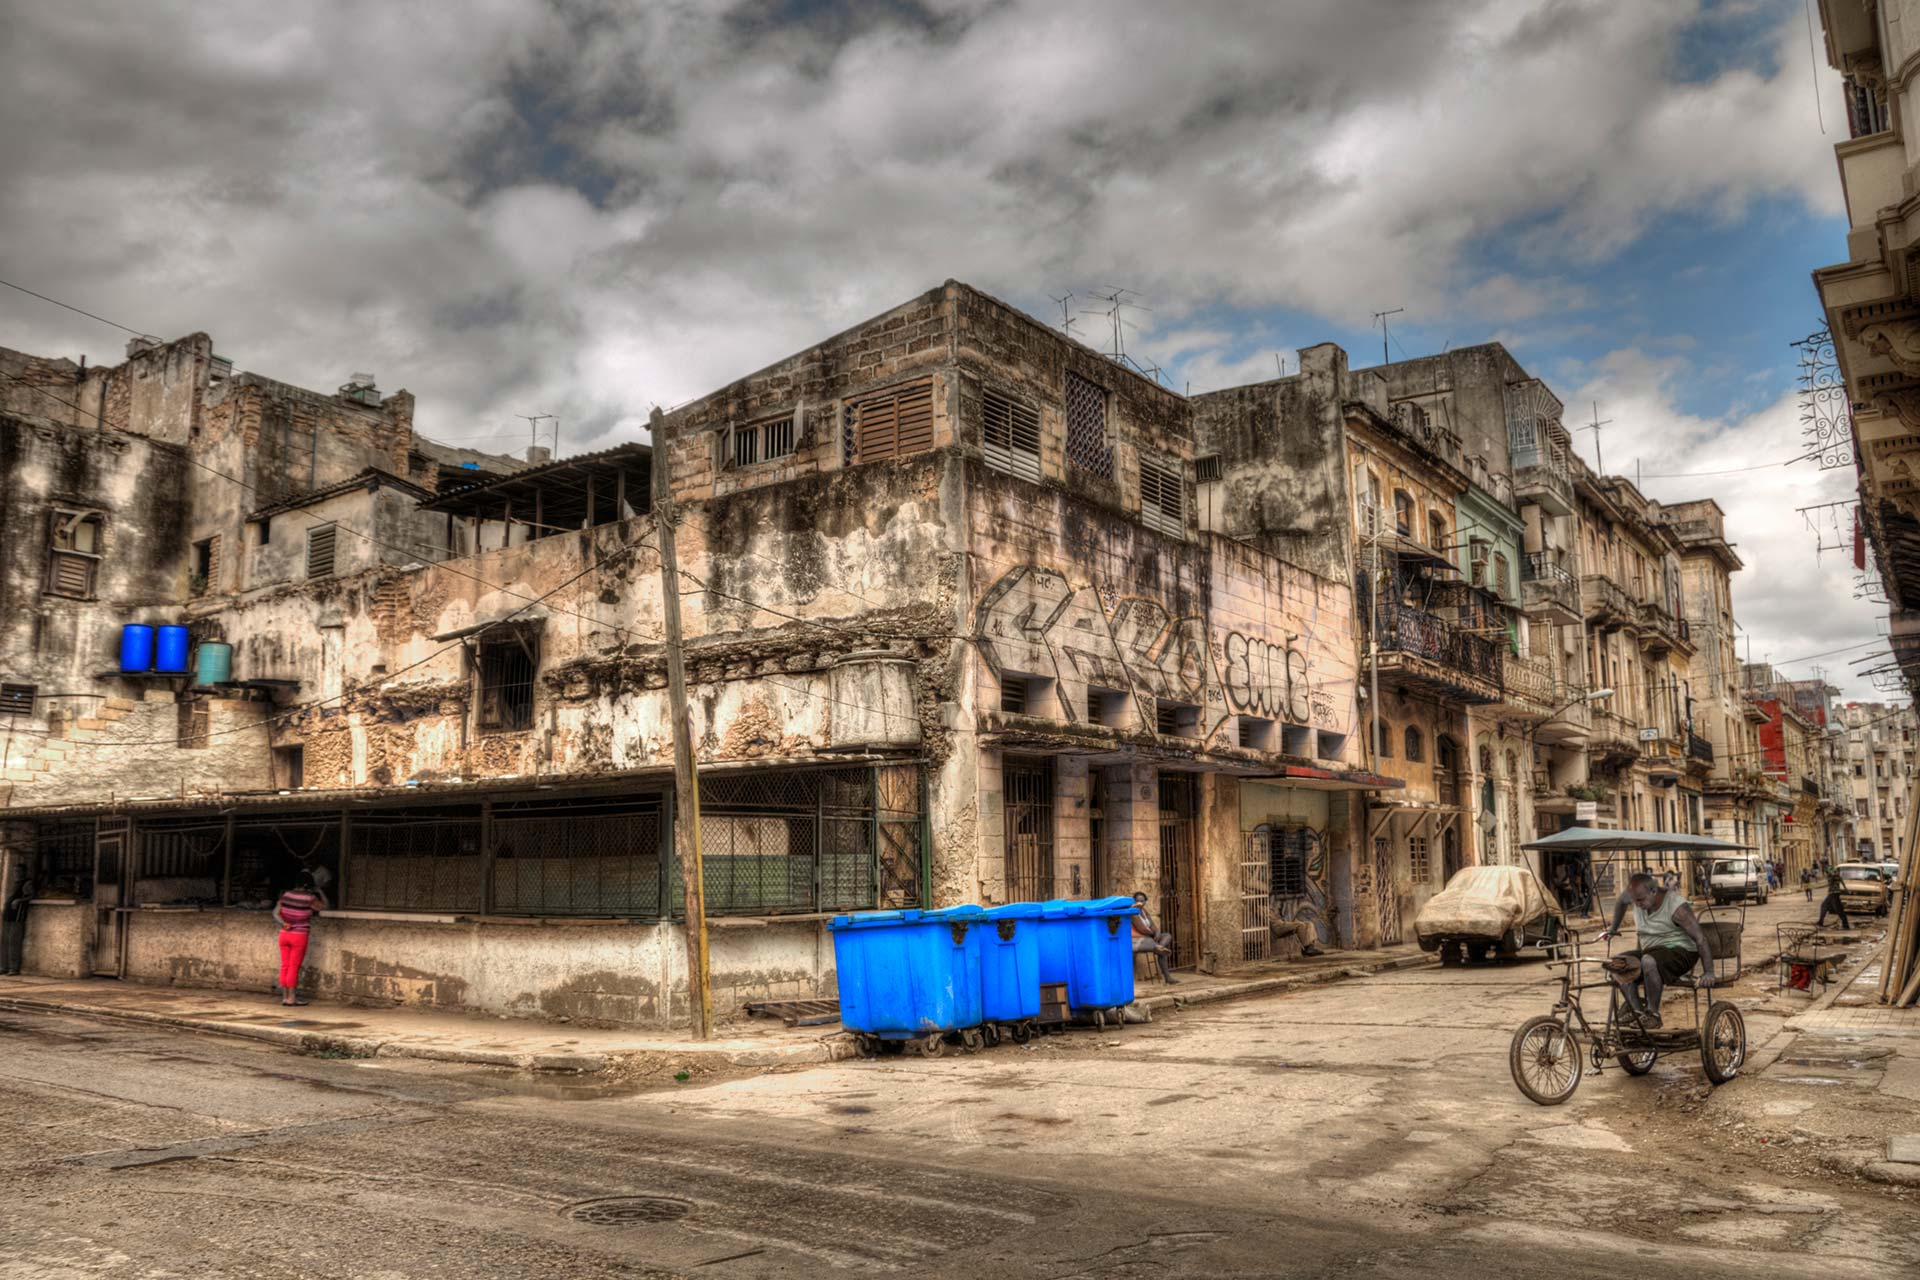 Reisefotografie - Havana Vieja, Kuba.